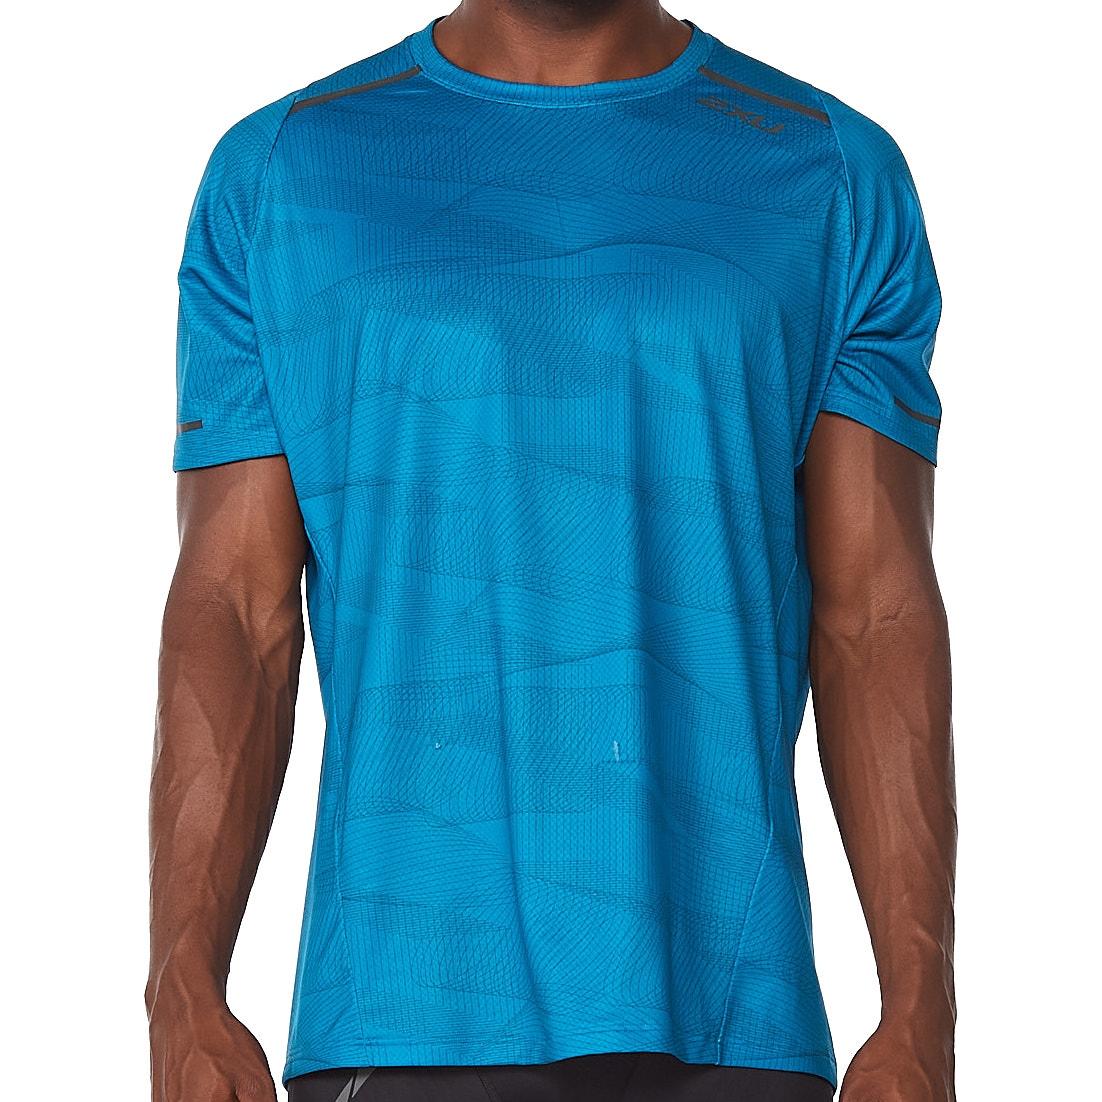 2XU Light Speed Camiseta - linear aquamarine/black reflective